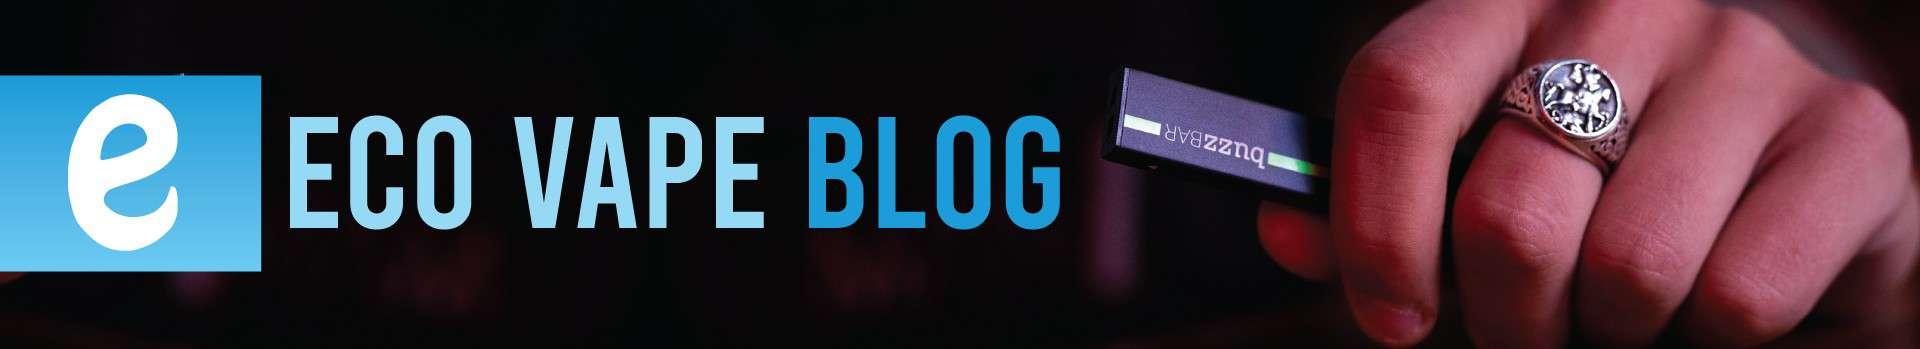 eco vape blog articles